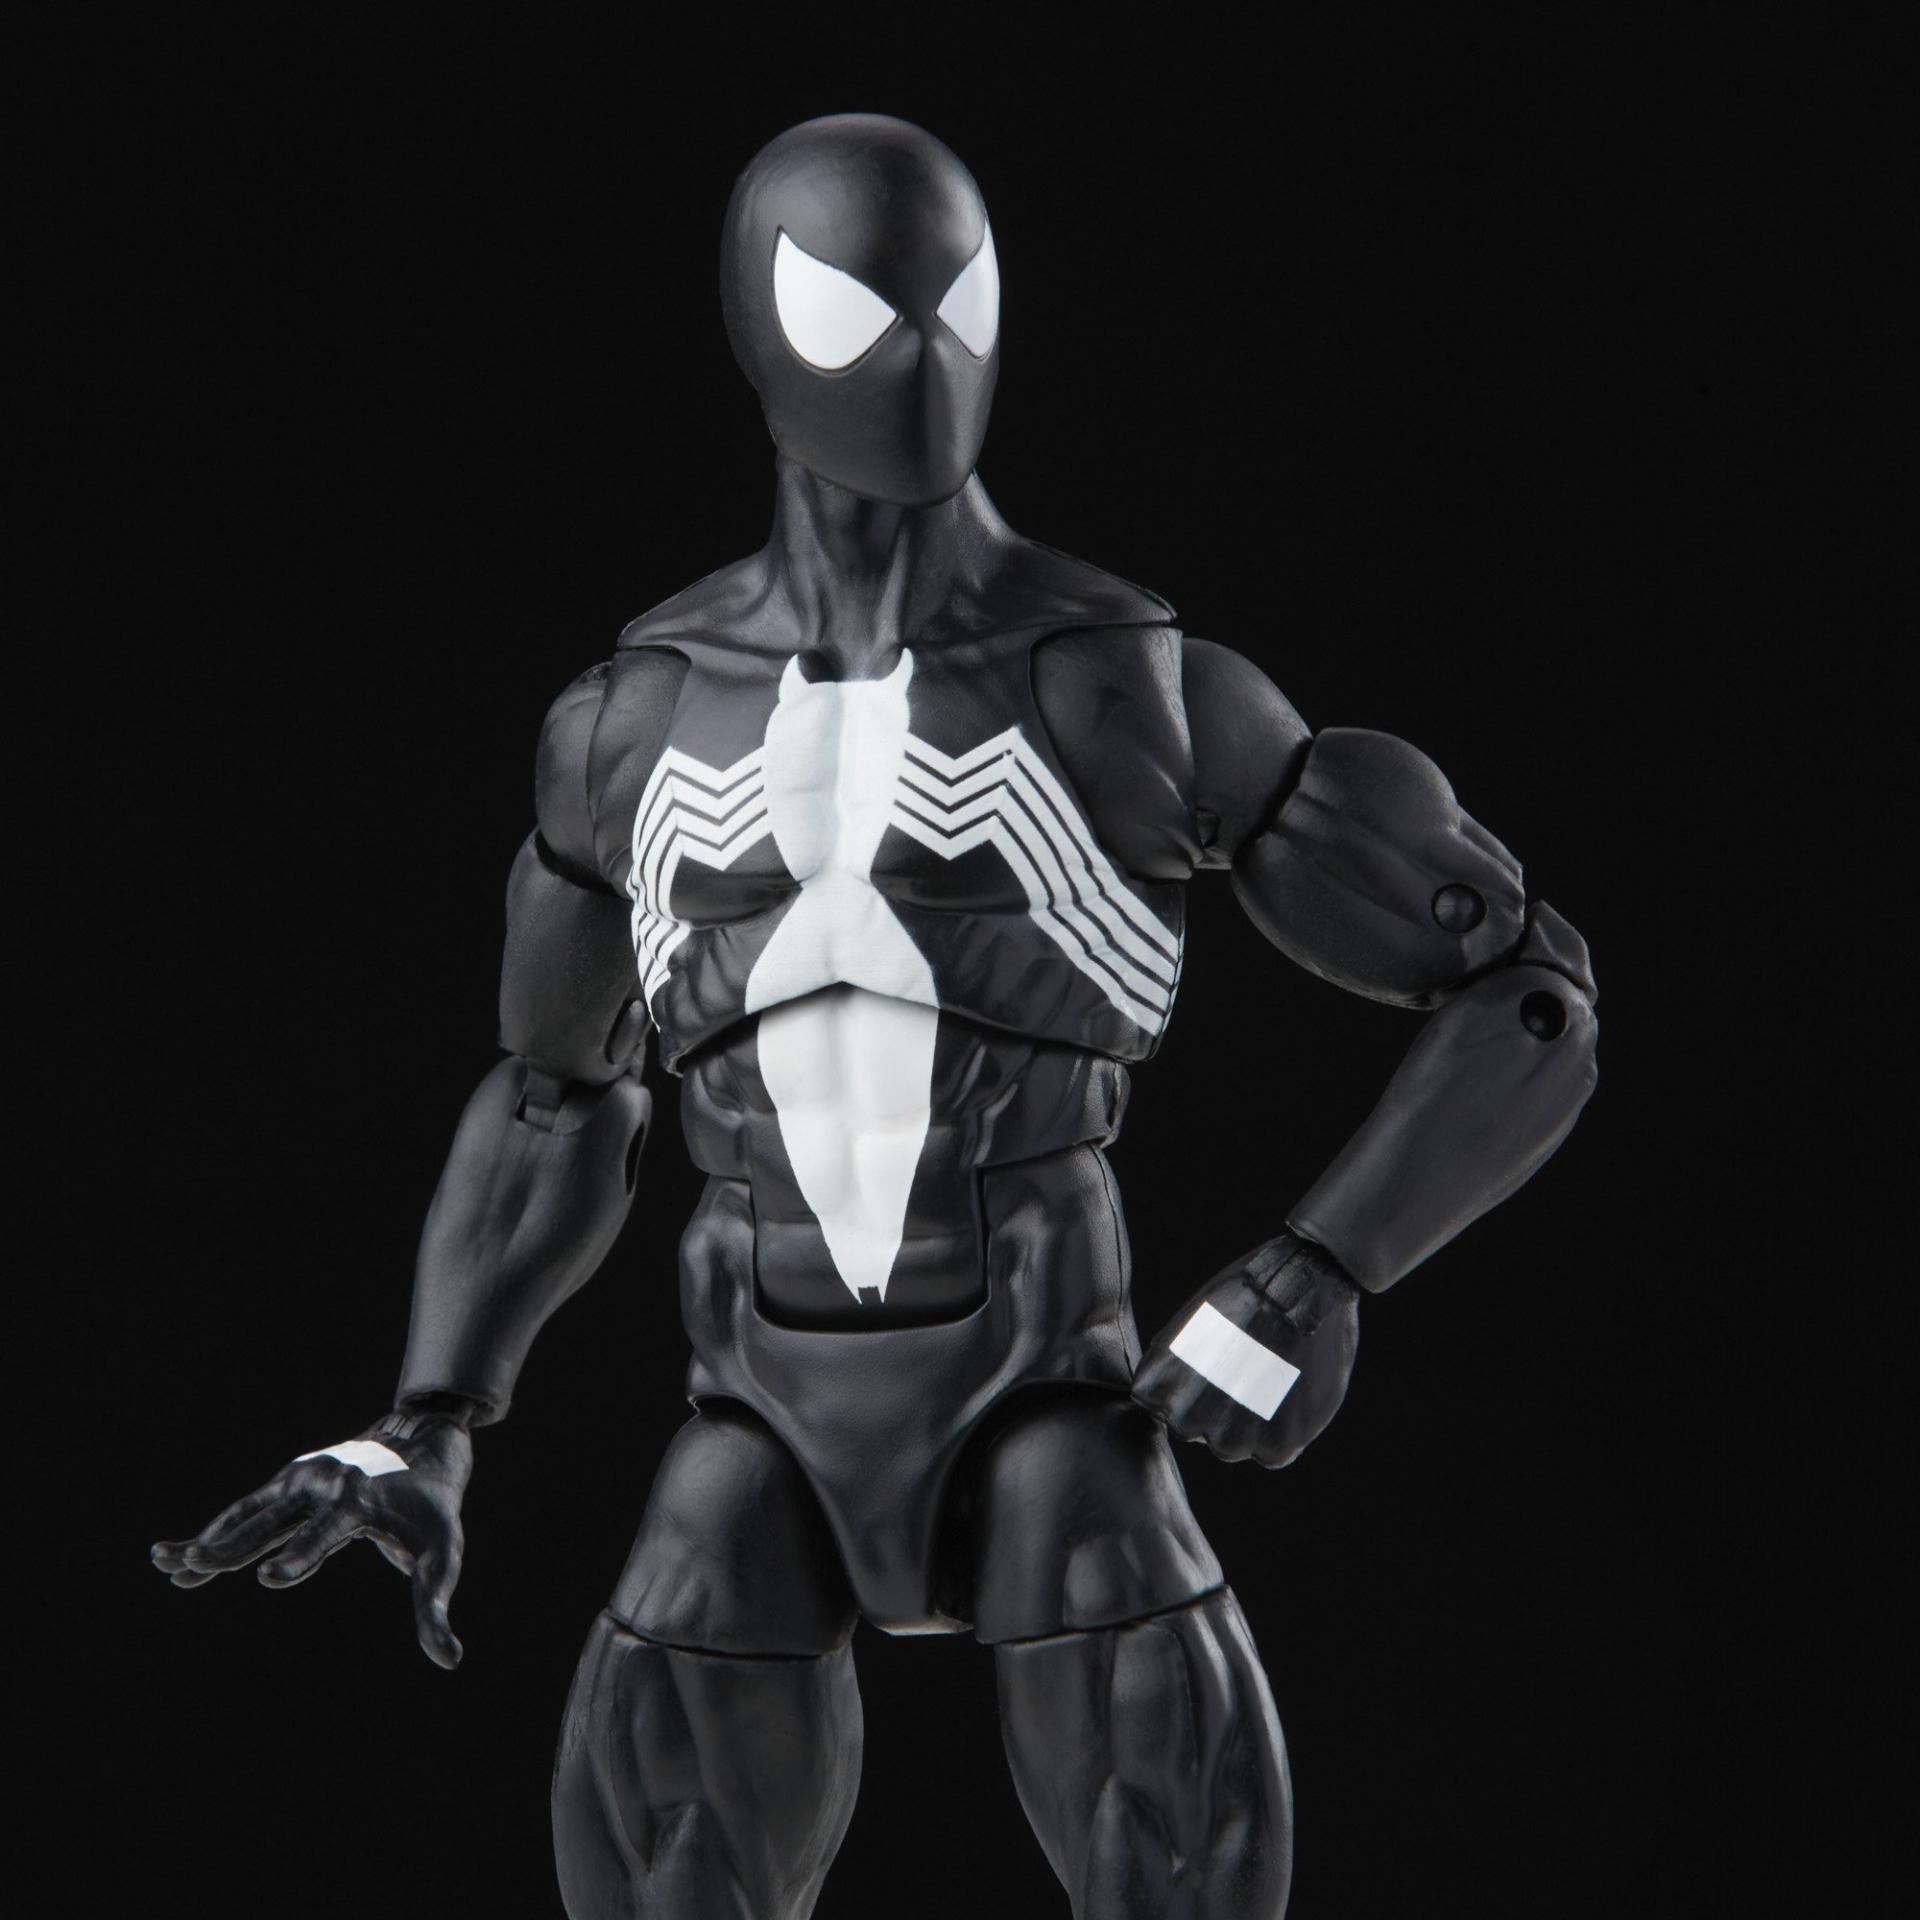 Marvel legends series hasbro symbiote spider man3